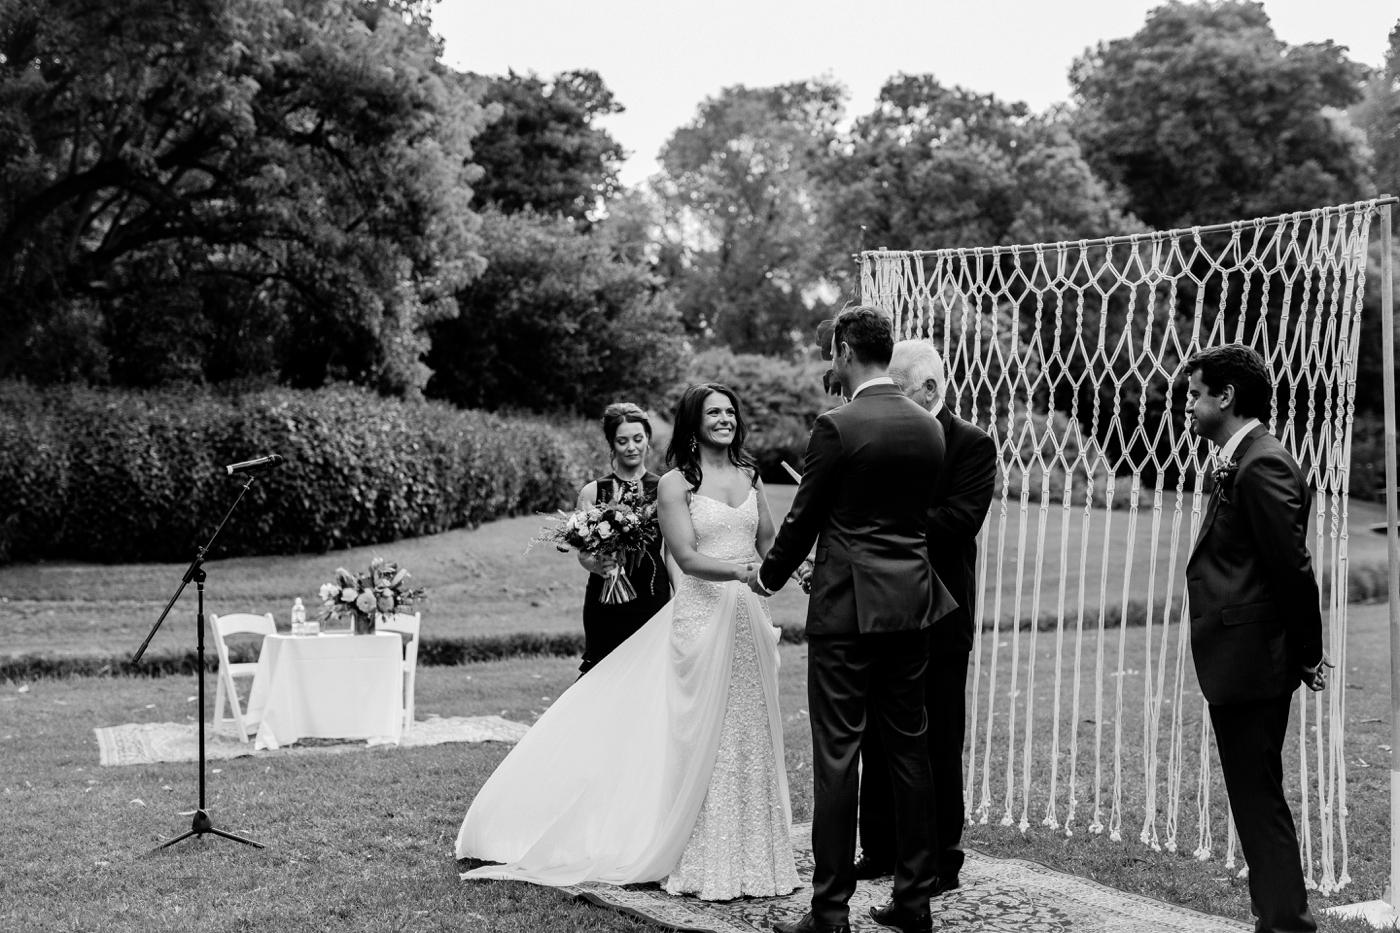 Kellie & Brent - Adelaide City Wedding - Natural wedding photography in Adelaide - Katherine Schultz - www.katherineschultzphotography.com 37